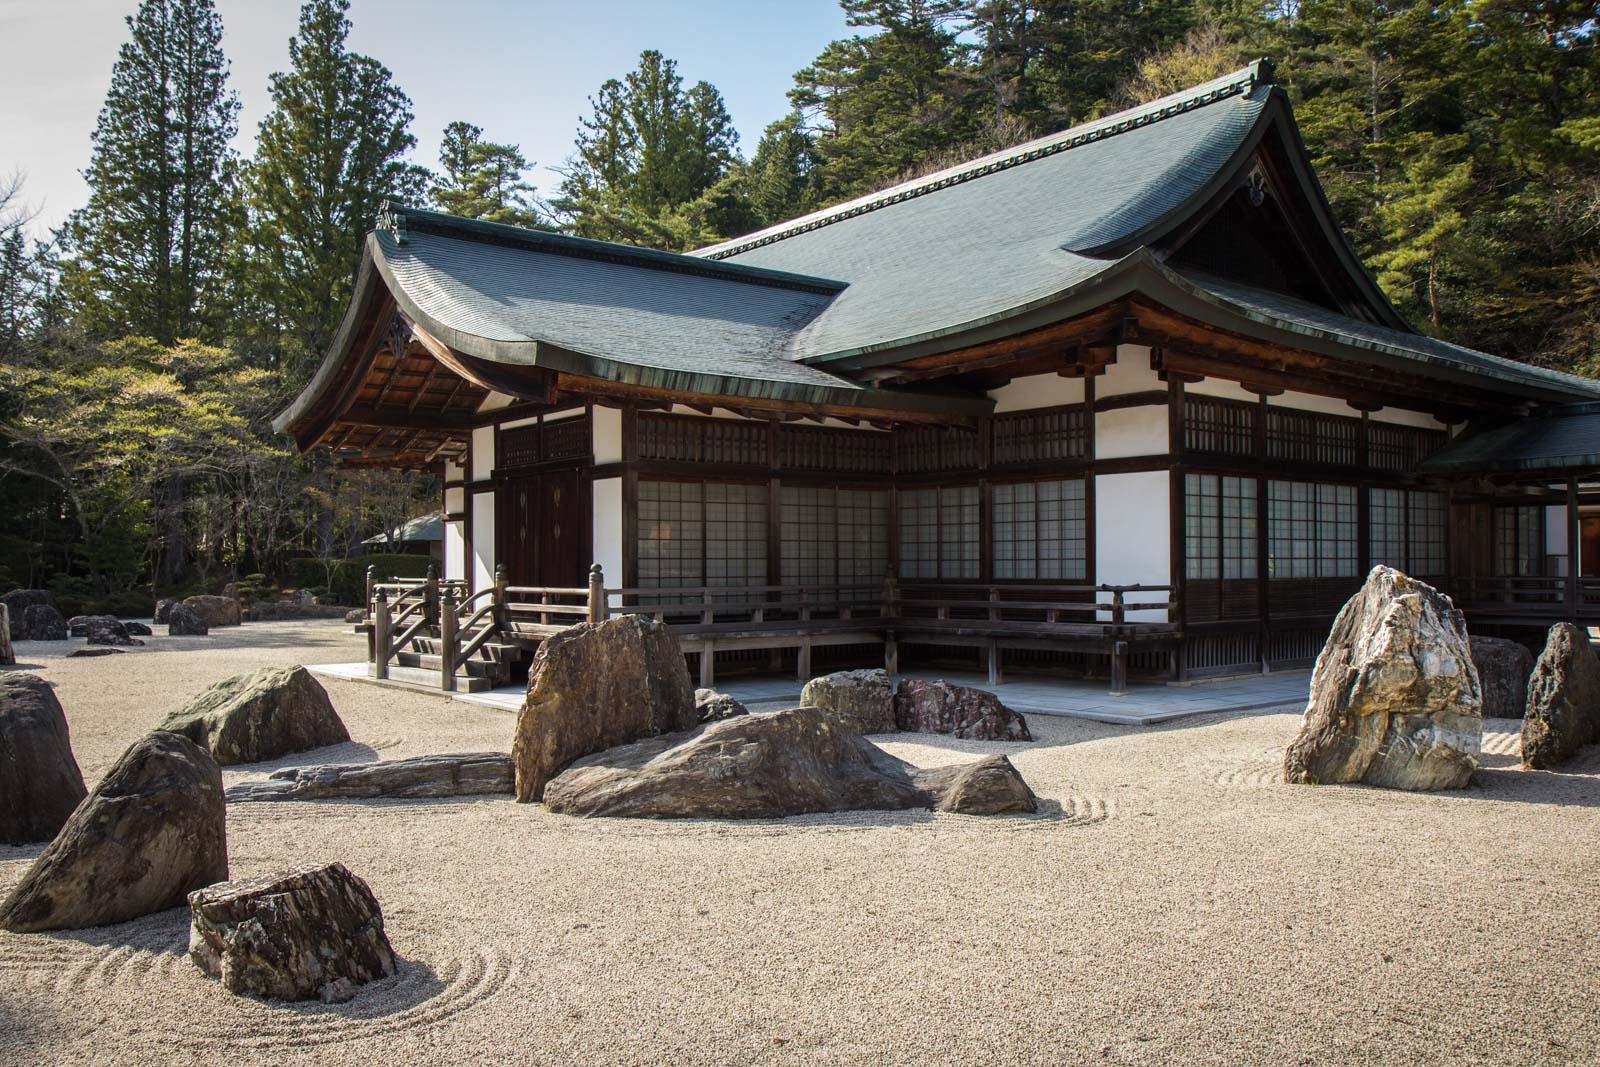 Koyasan, Japan, Kii mountains, world heritage, pilgrimage routes